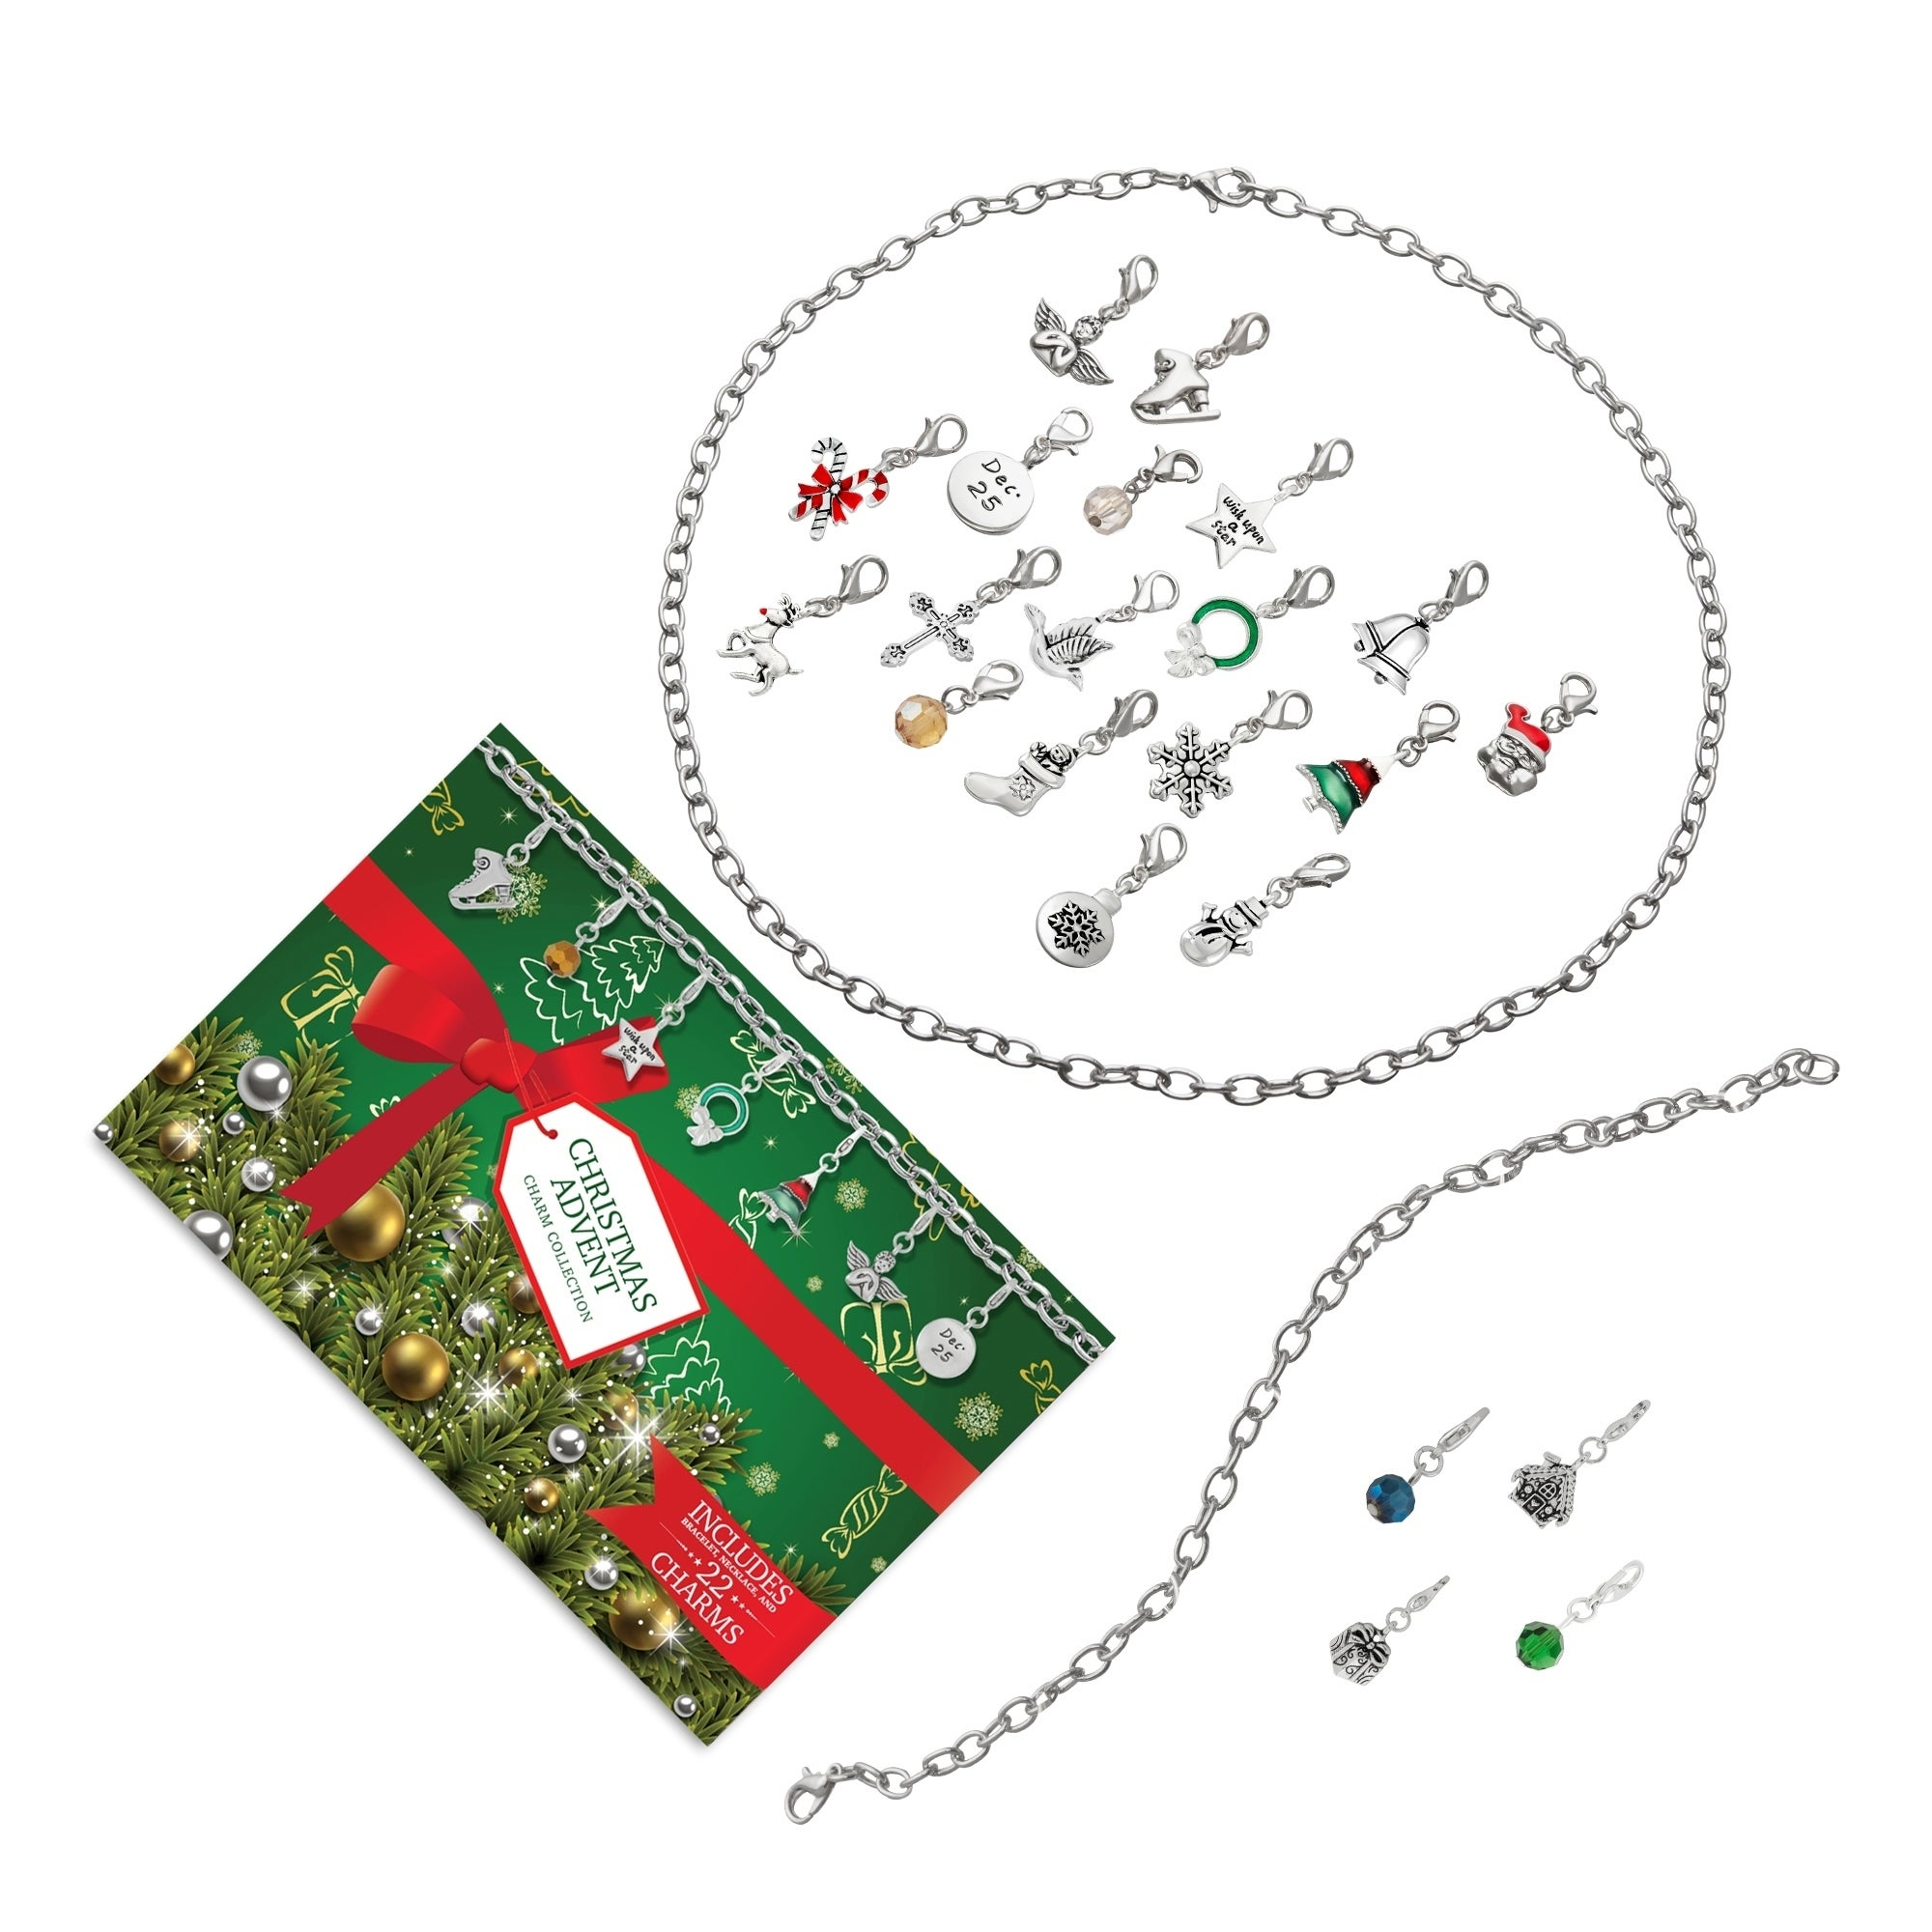 Isla Simone Christmas Advent Calendar Charm Jewelry Gift ...